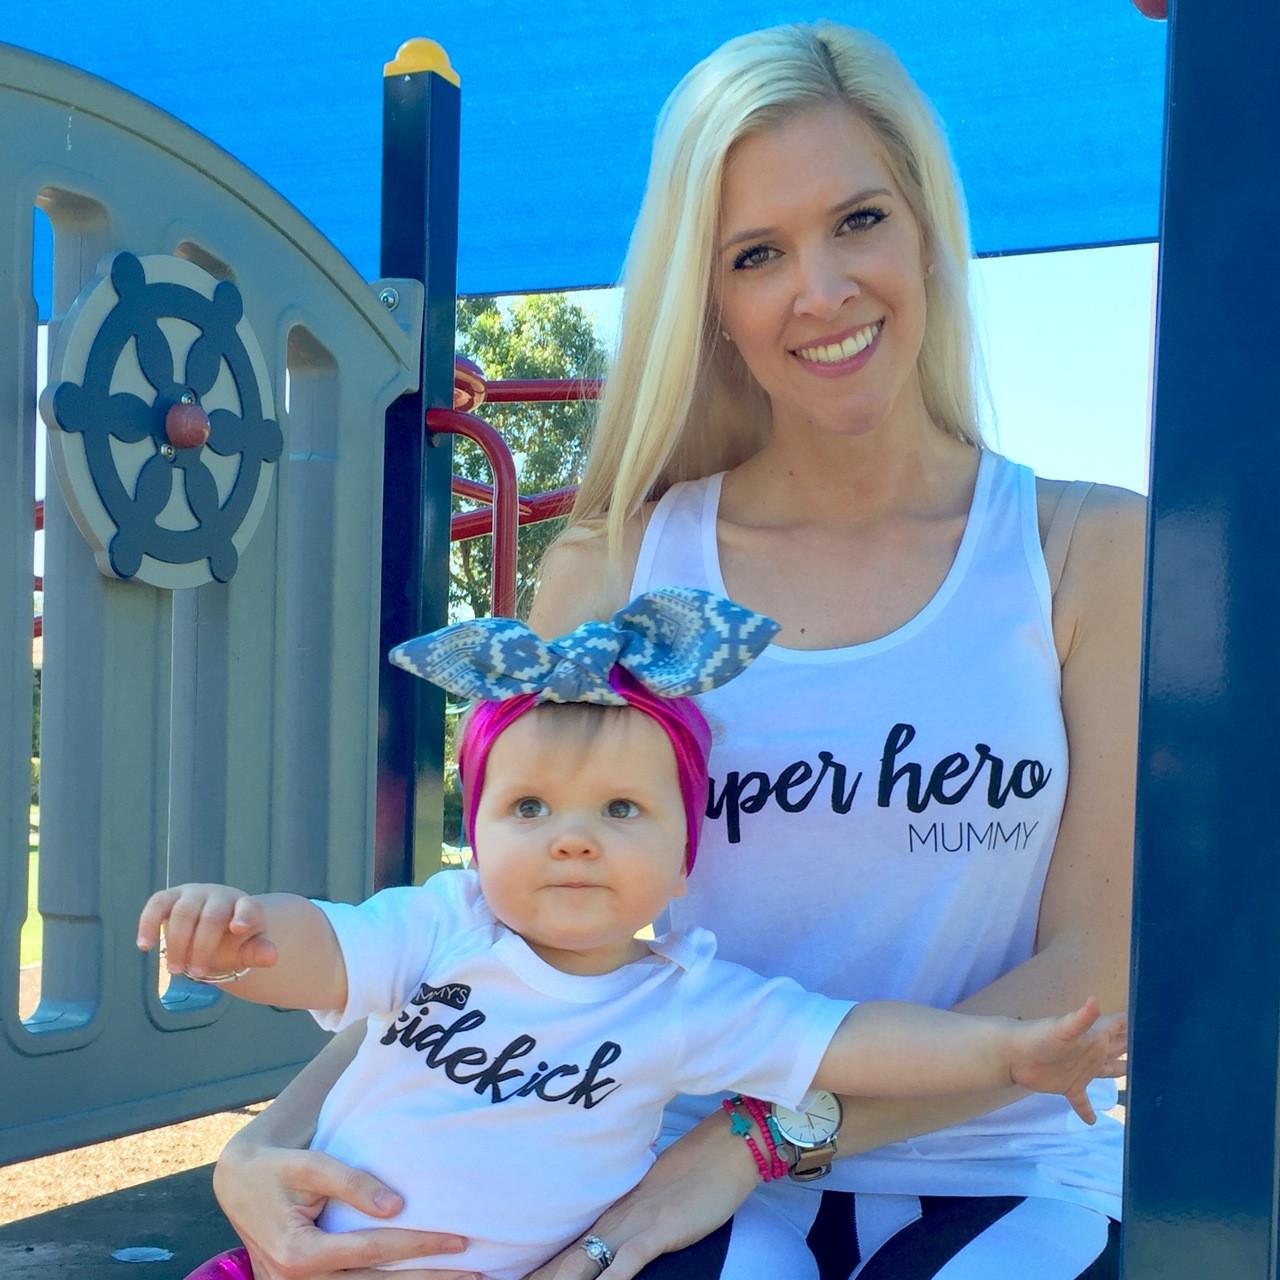 Mum S Sidekick Onesie Personalised Baby Products Word